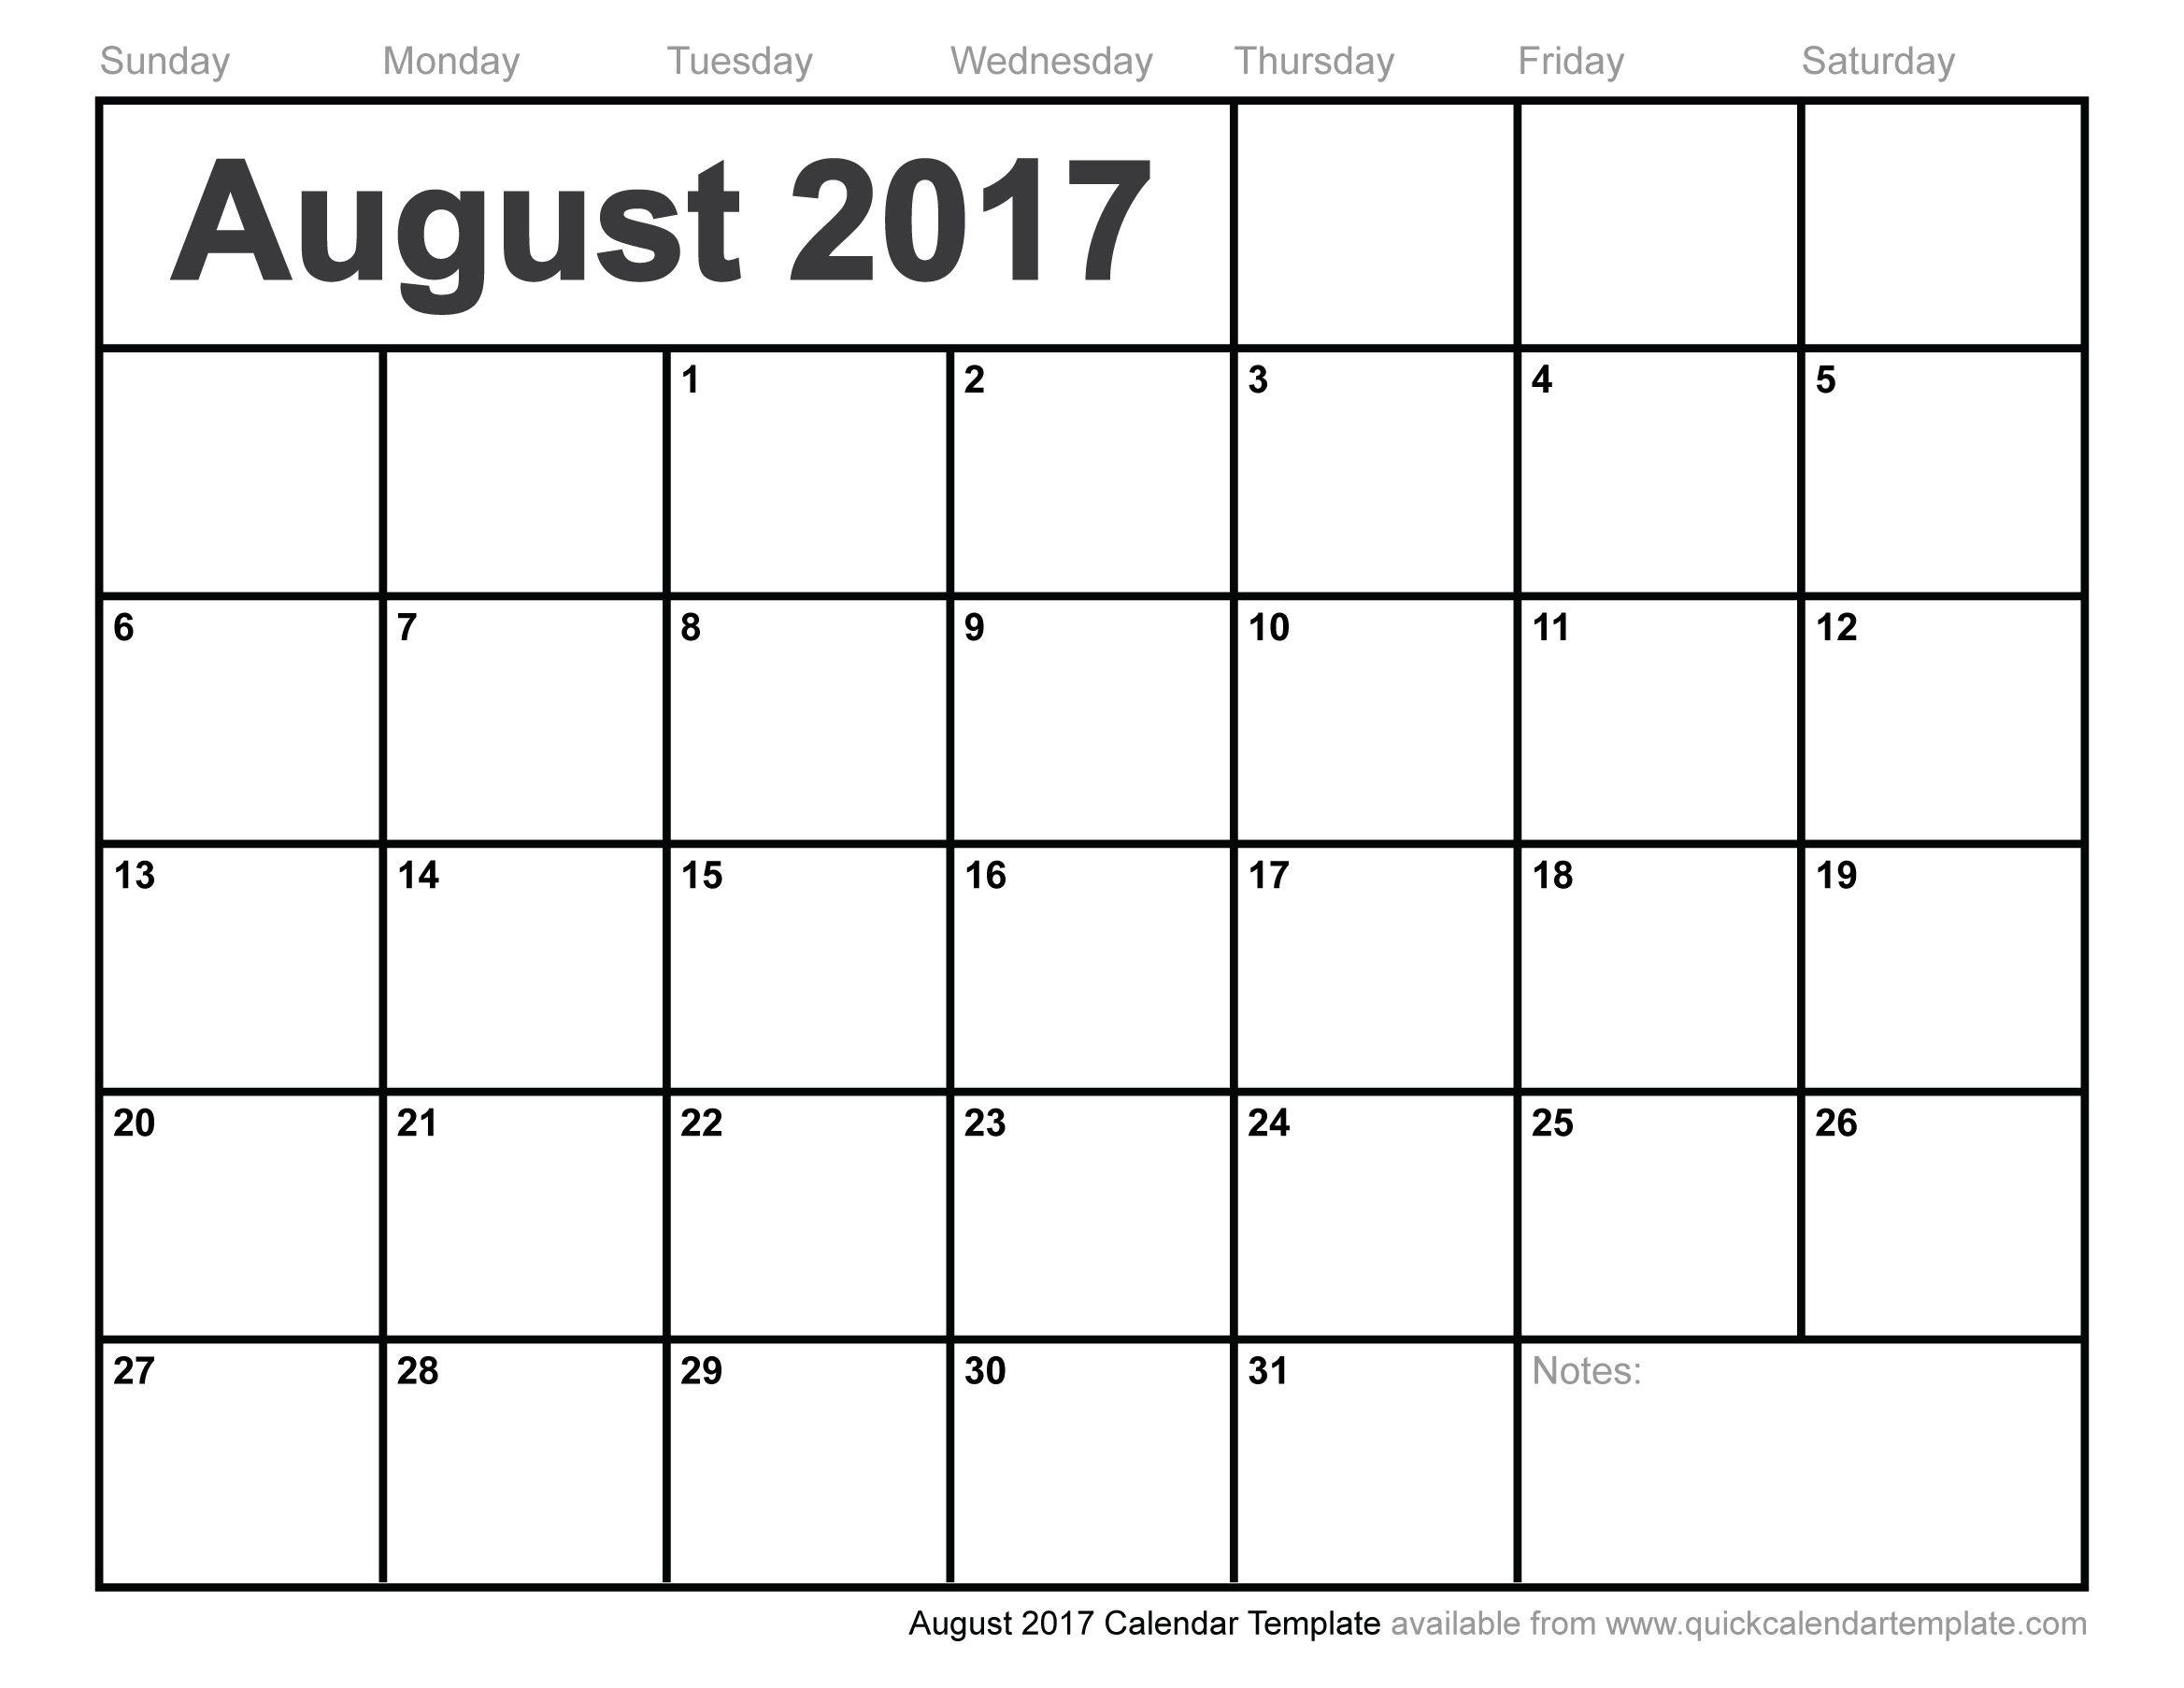 Blank August 2017 Calendar | August 2017 Calendar | June Calendar - Free Printable August 2017